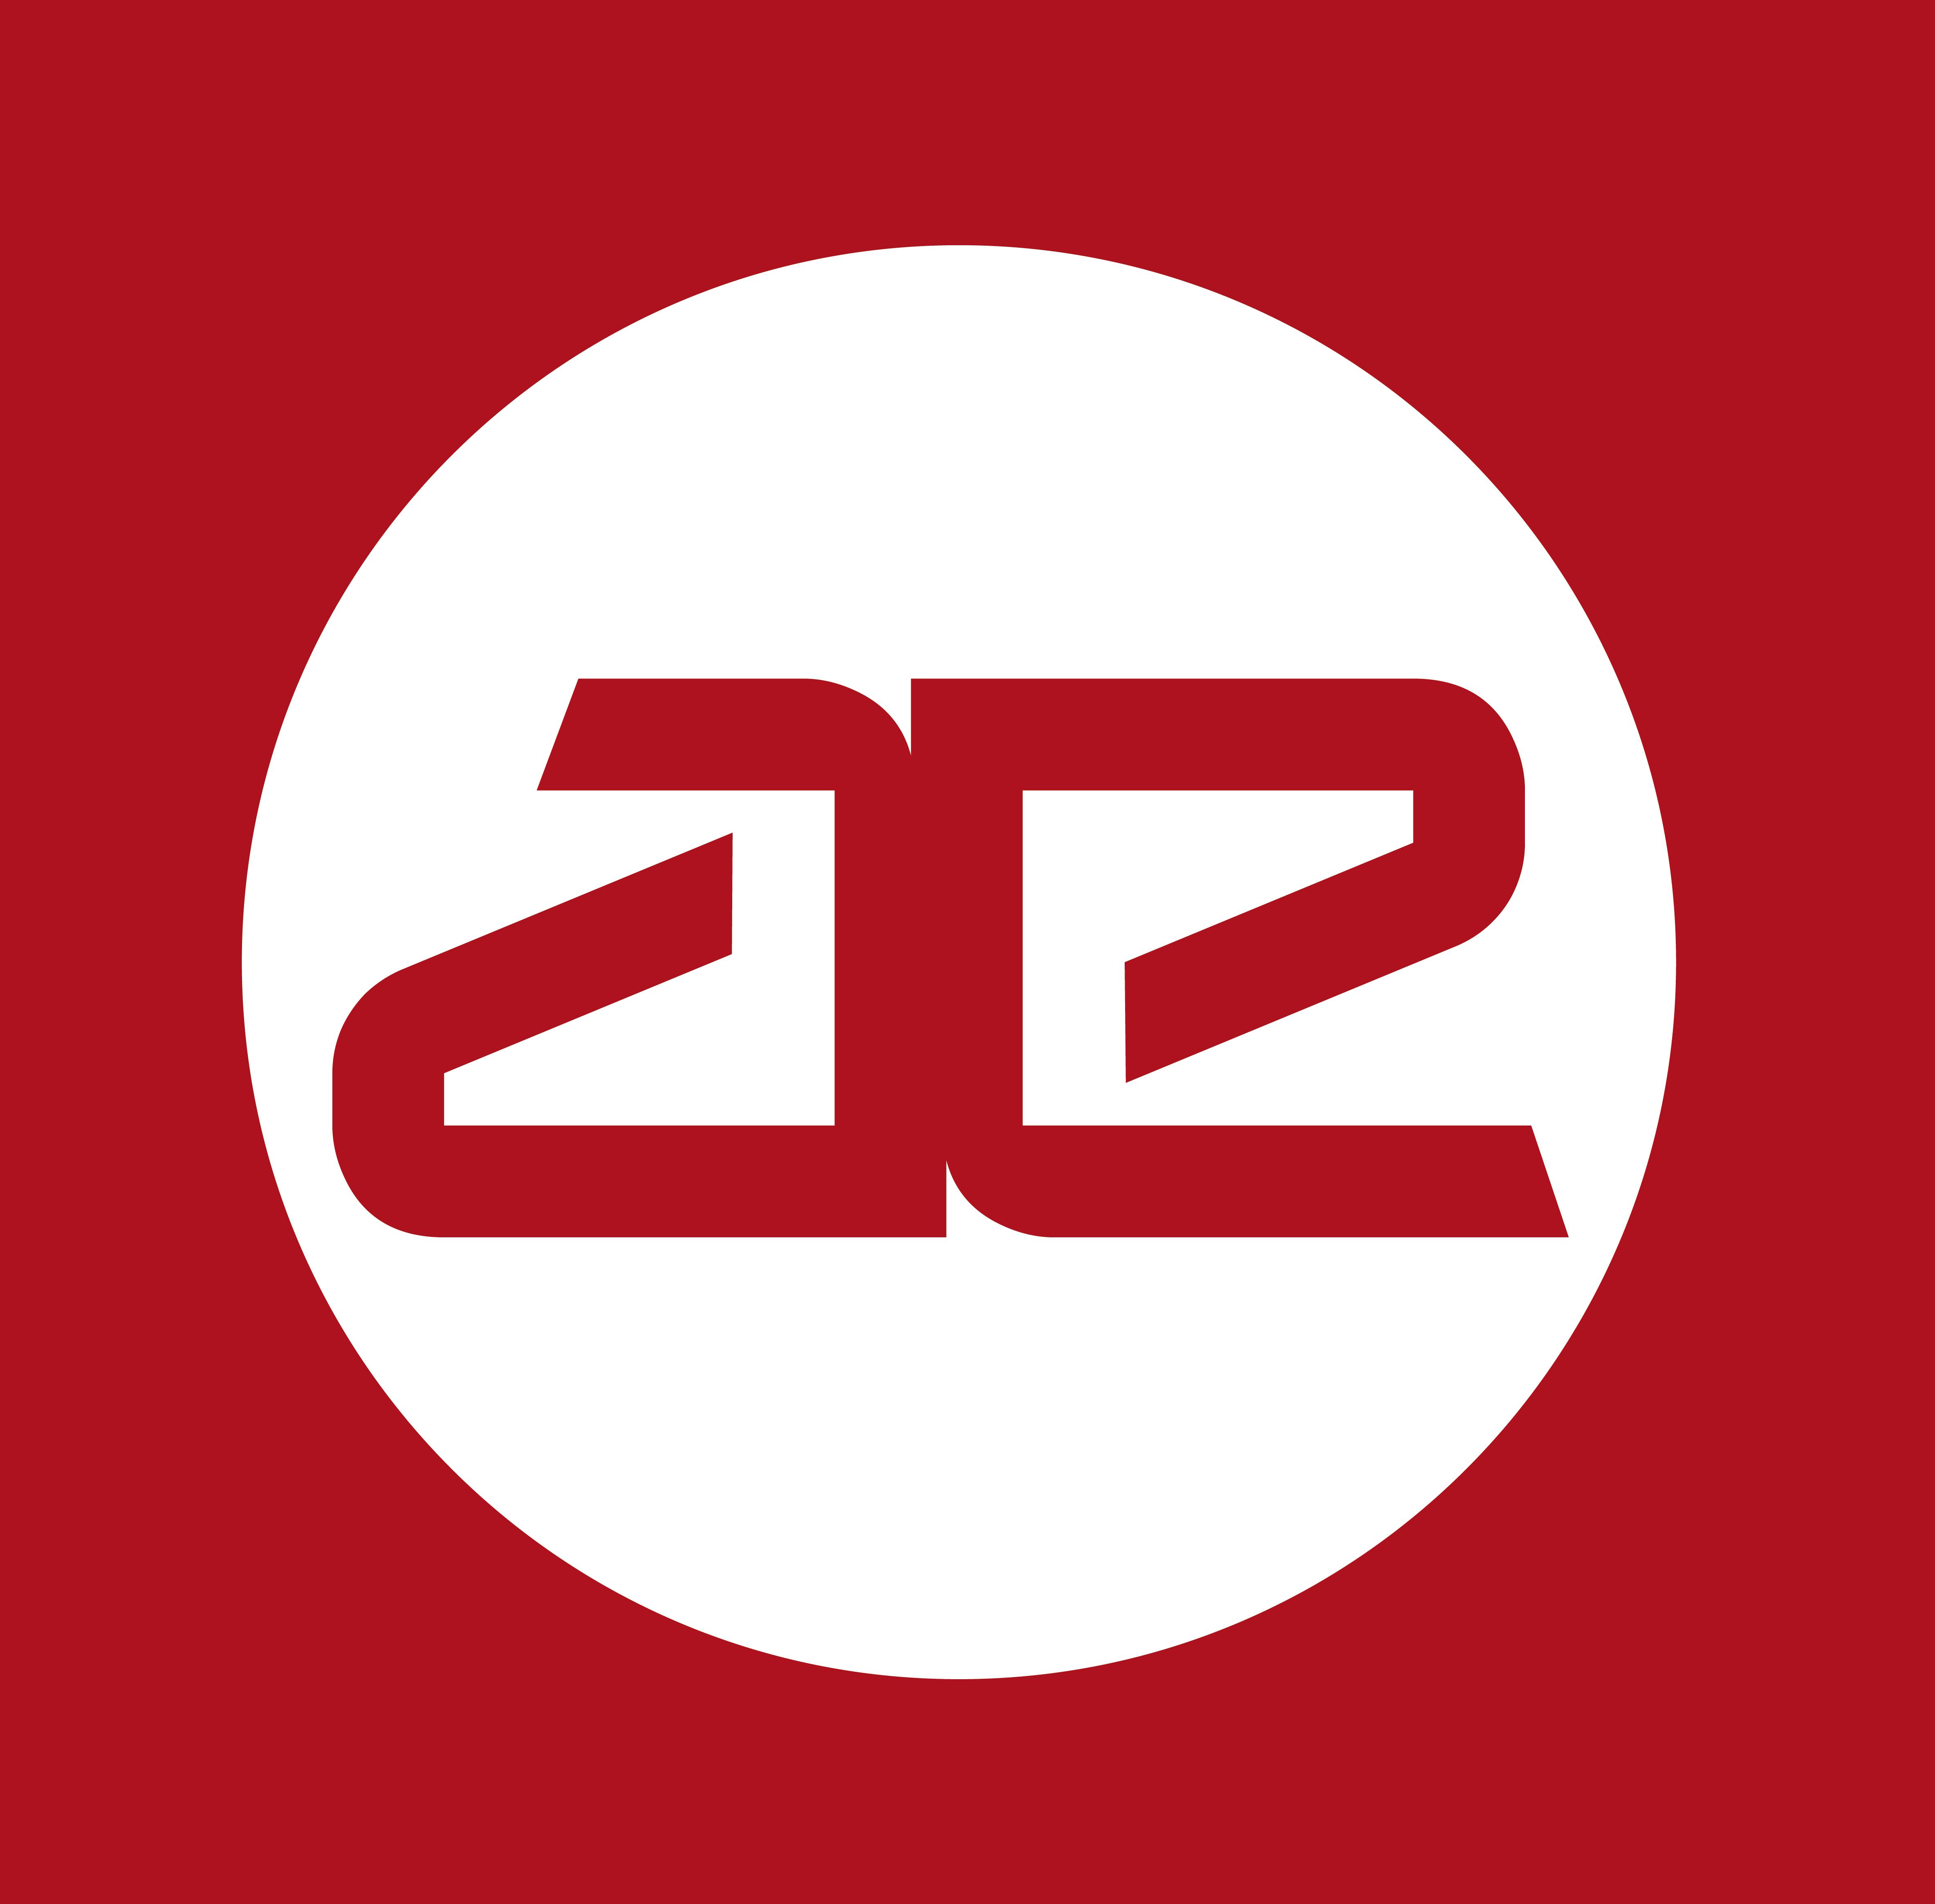 Parsec - Polyester Longline Webbing